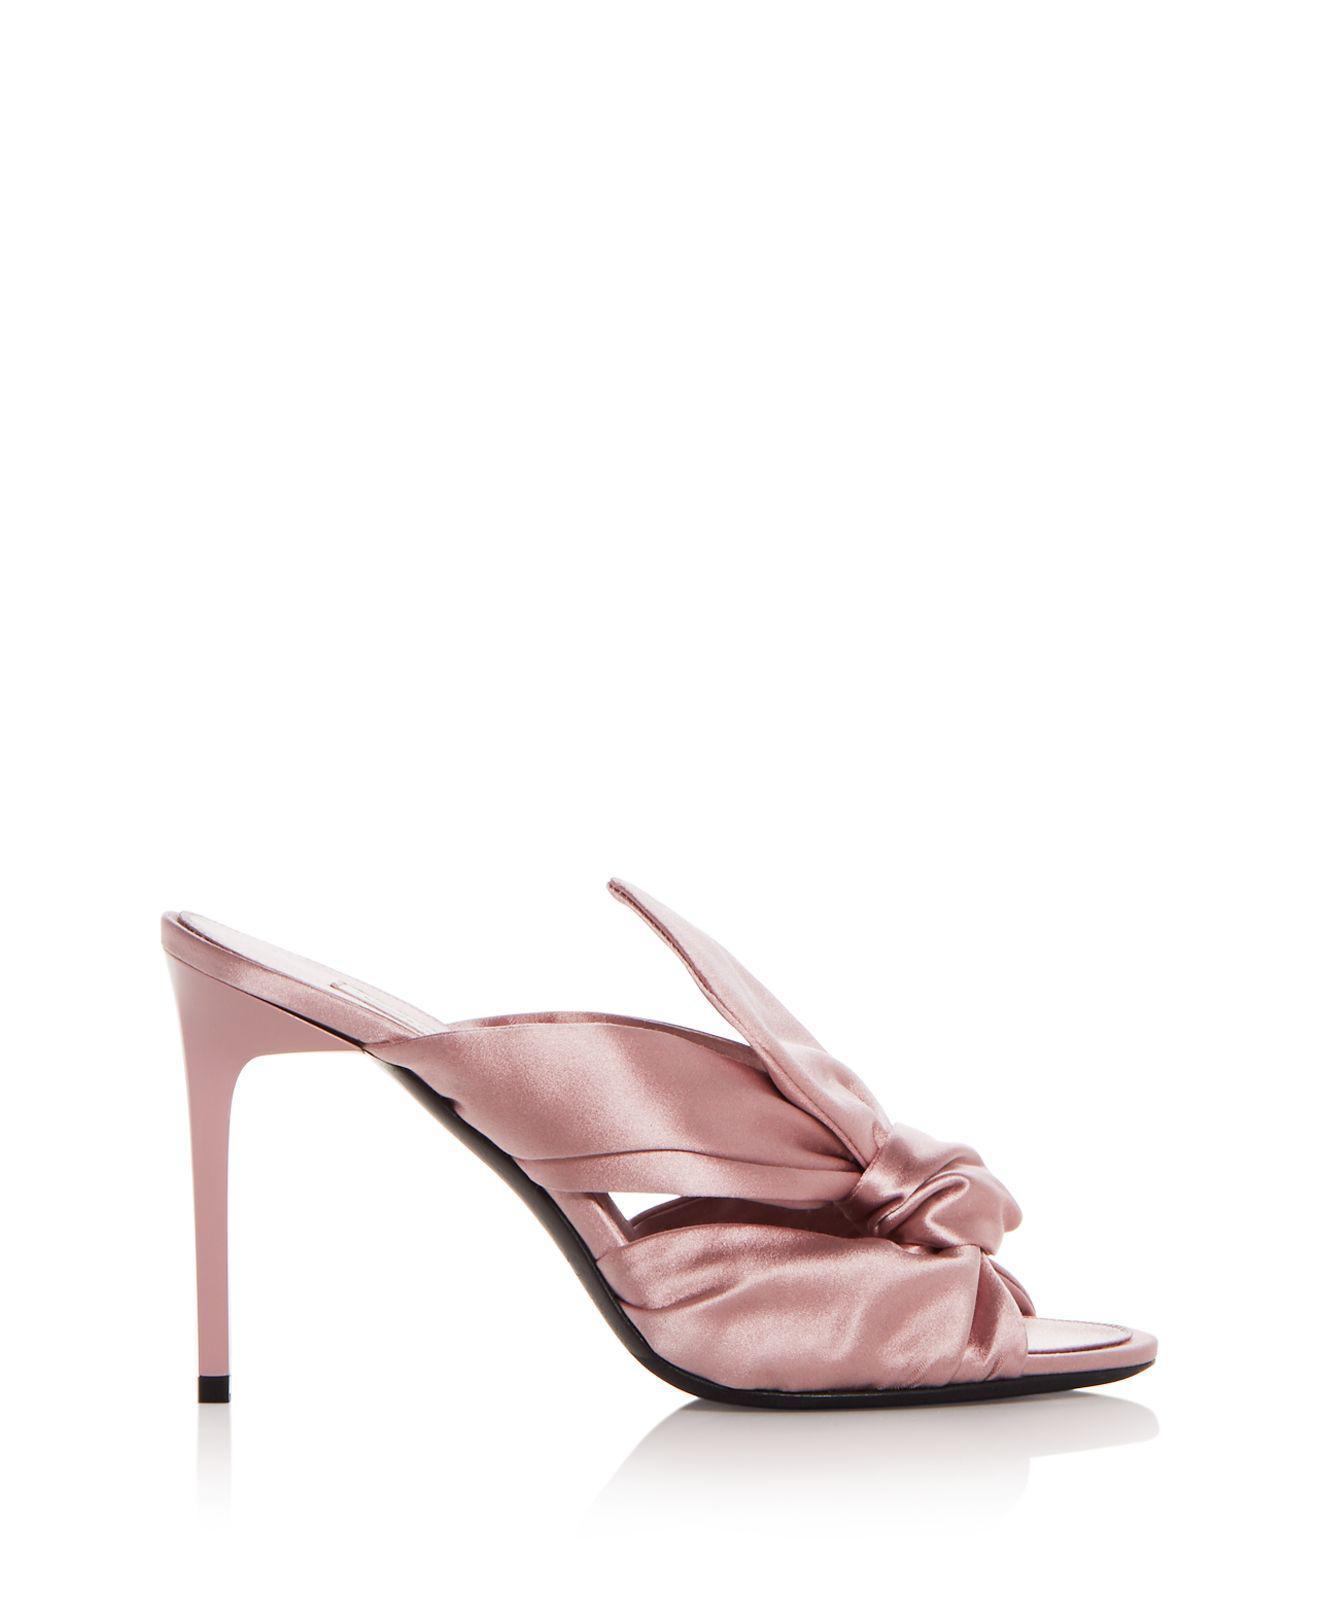 Oscar de la Renta Women's Paige Satin Knot High-Heel Slide Sandals 8ZxHZhv7h